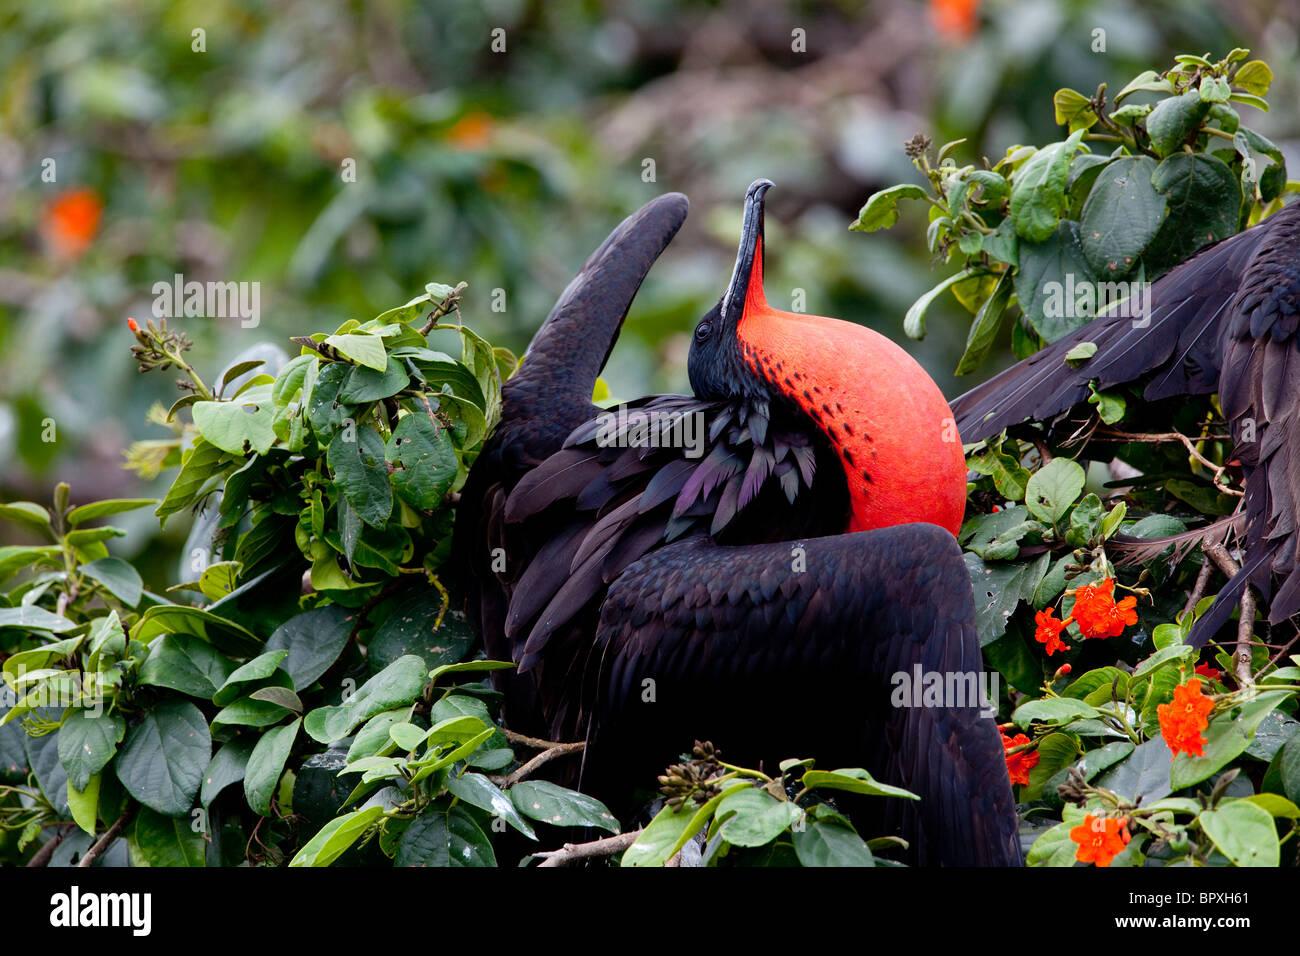 Frigate Bird - Halfmoon Caye, Belize - Stock Image